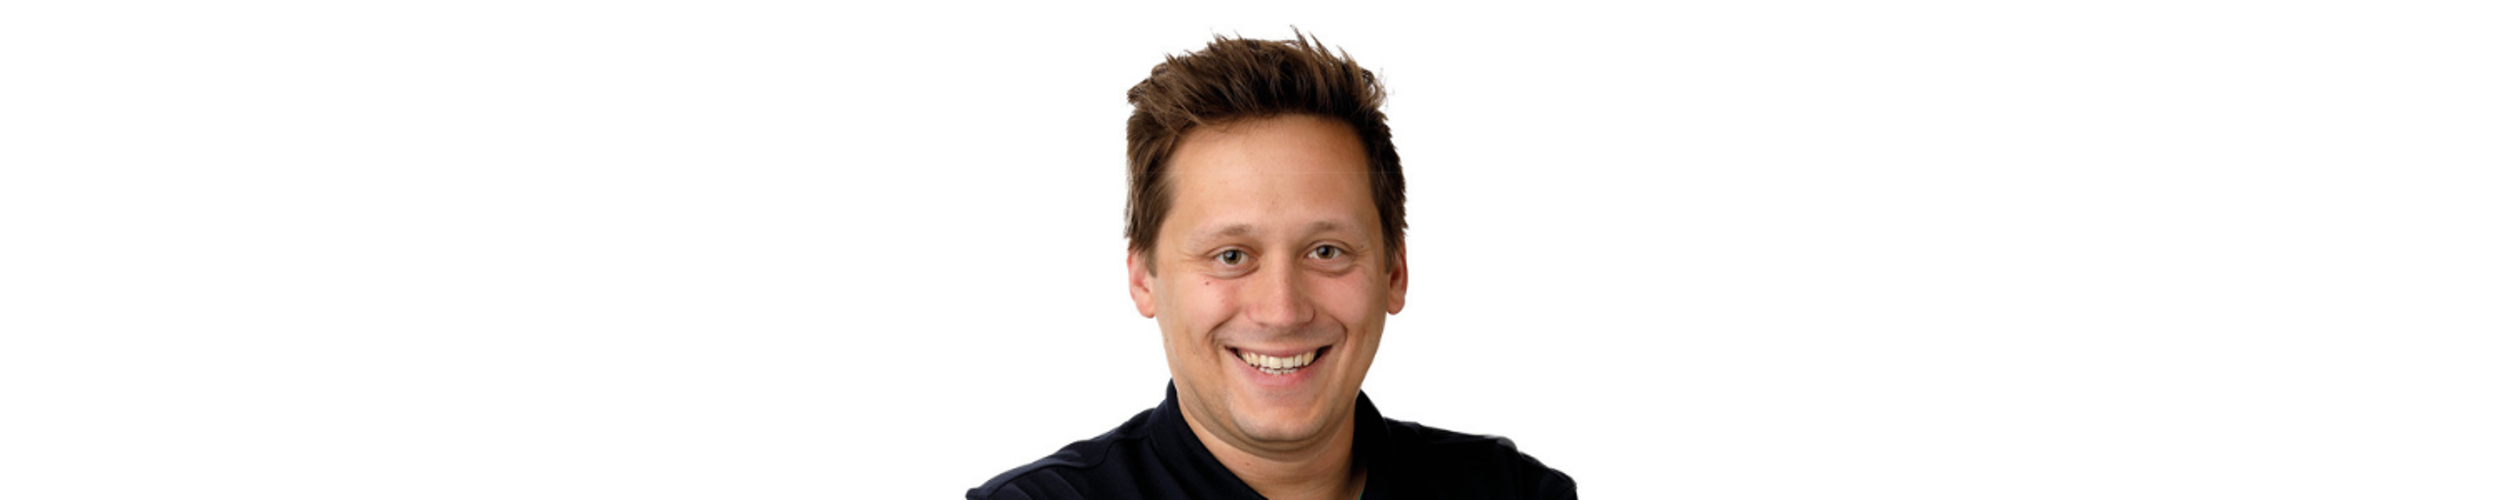 Sander Deflo